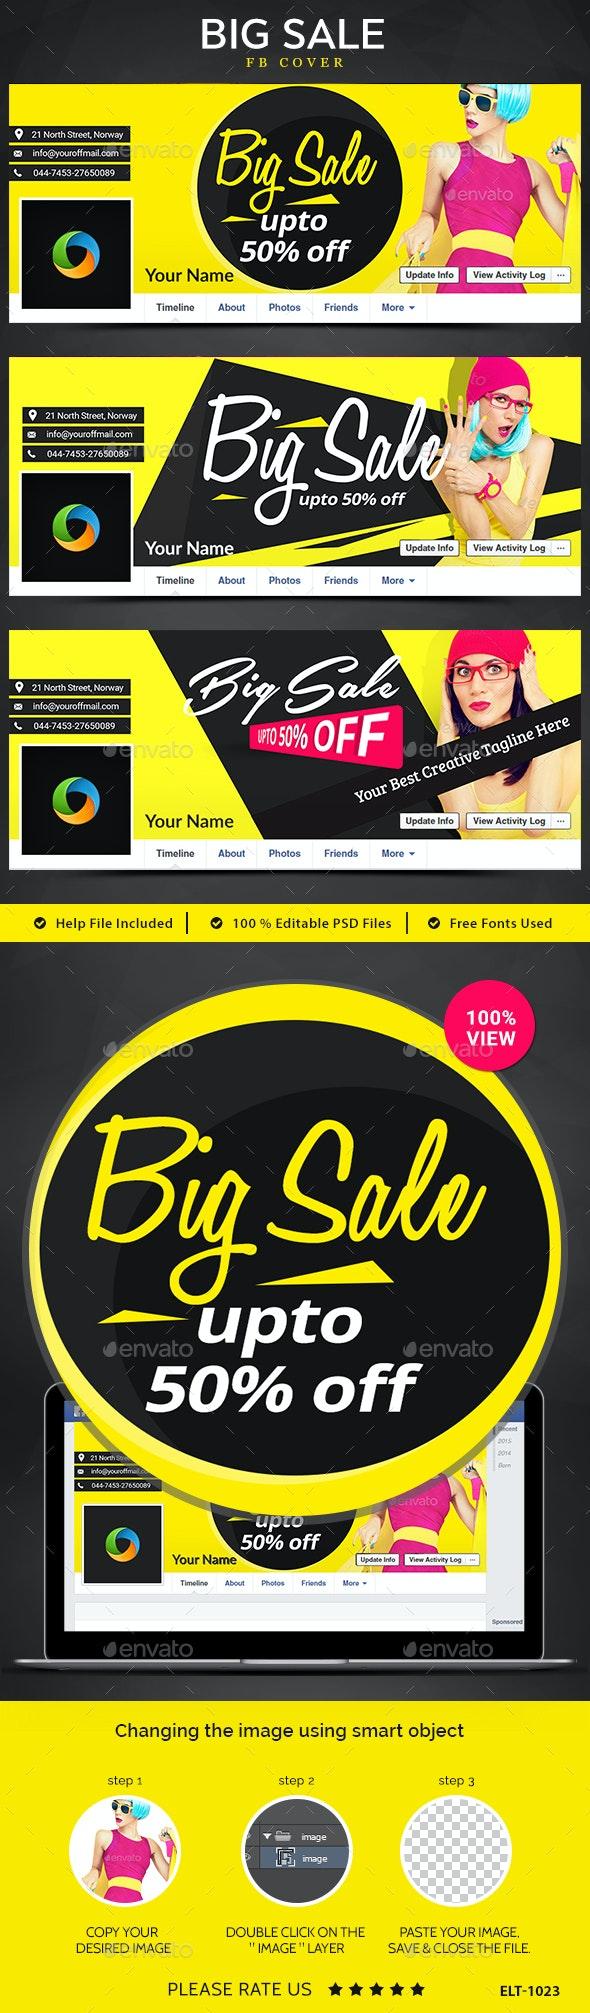 Big Sale Facebook Covers - 3 Designs